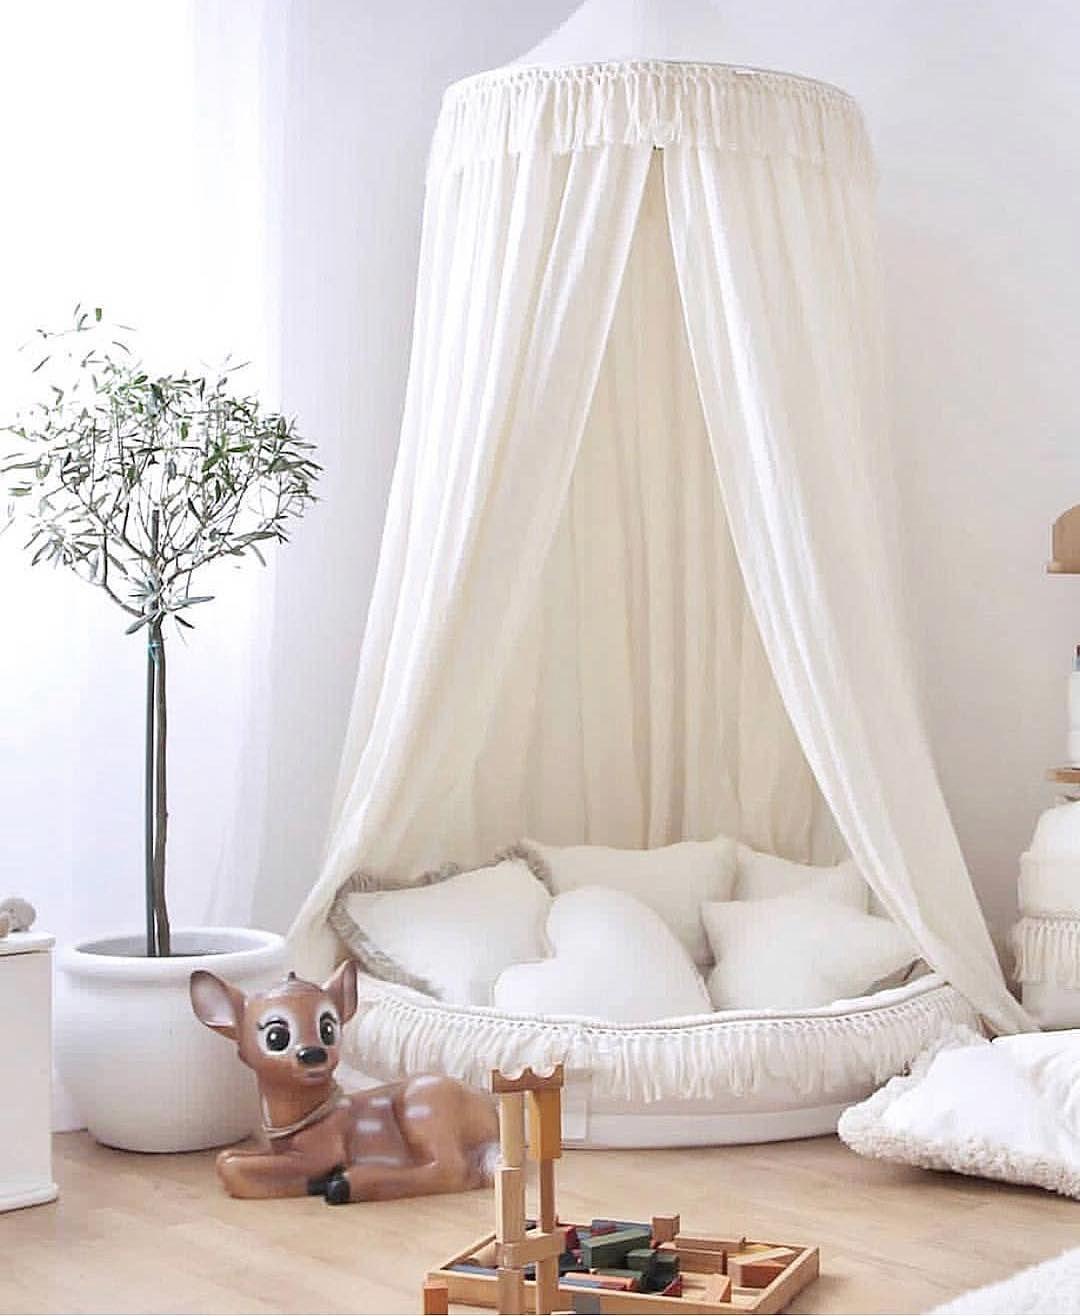 Awesome 14 Best Interior Design Shows On Netflix 2018 Baby Room Decor Girl Bedroom Designs Kid Room Decor